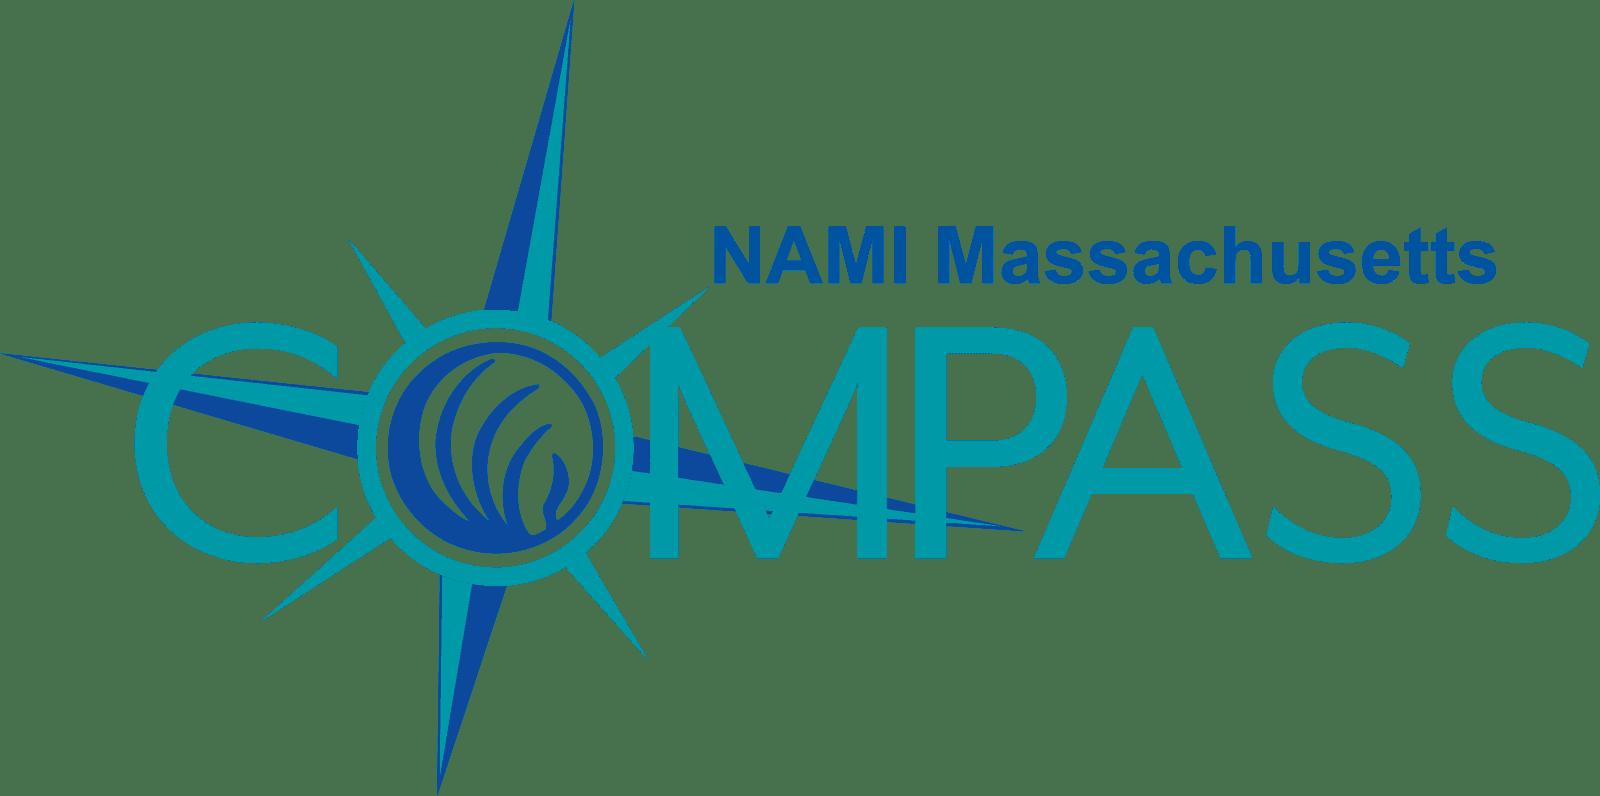 NAMI Massachusetts Compass Helpline logo